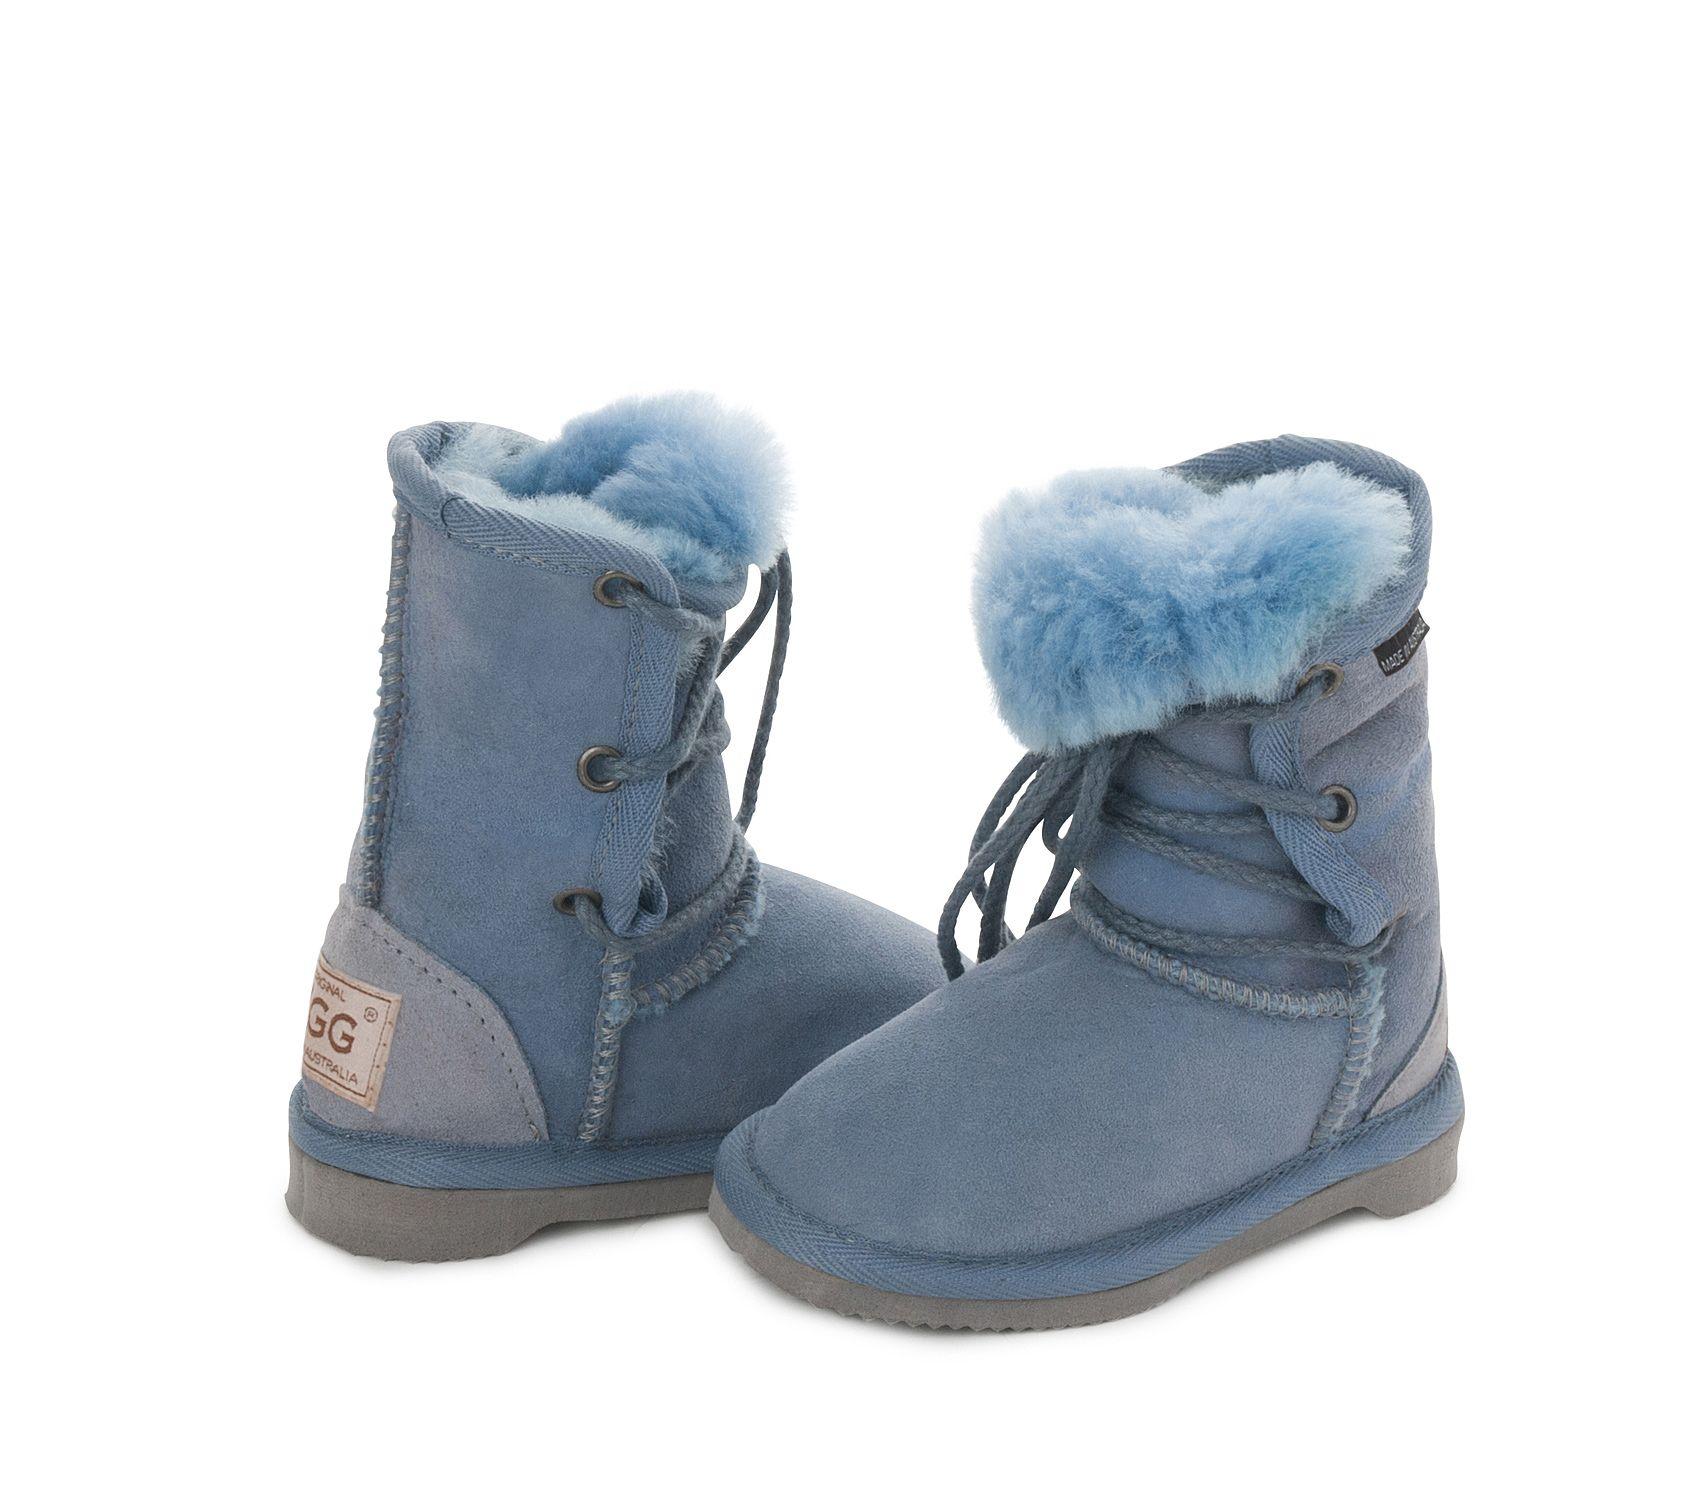 2ef33cd0646 Blue Lacey Kids UGG Boots #blue #aussie #ugg #uggboots #australian ...